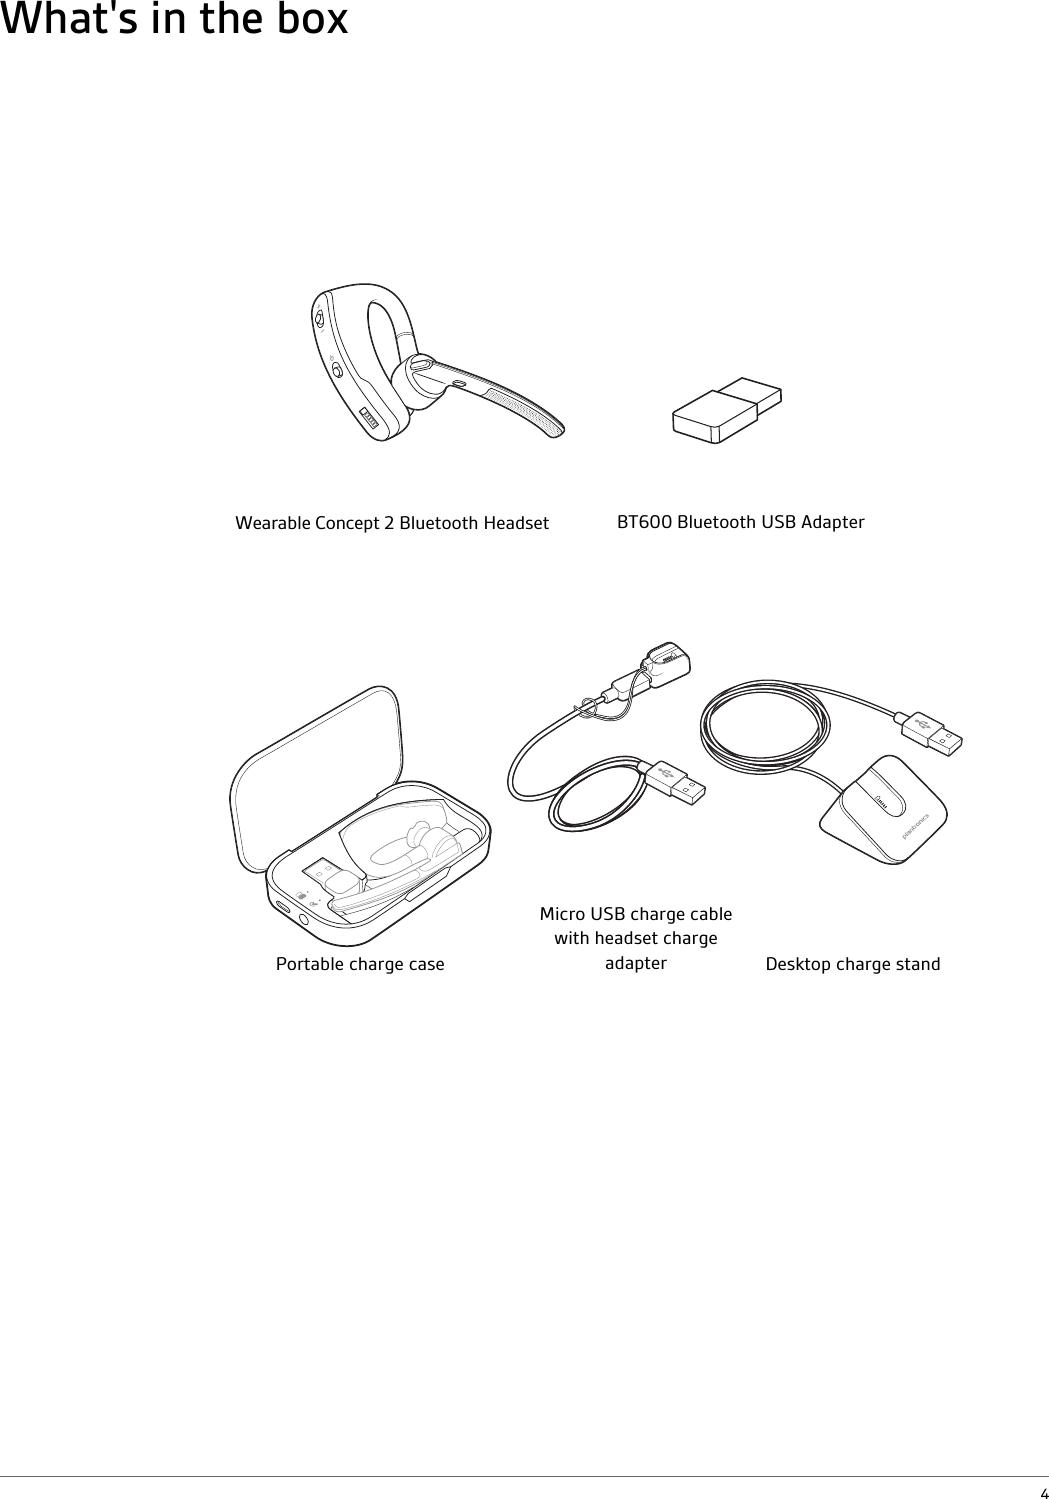 Plantronics WC2 Bluetooth Headset User Manual 06a Wearable